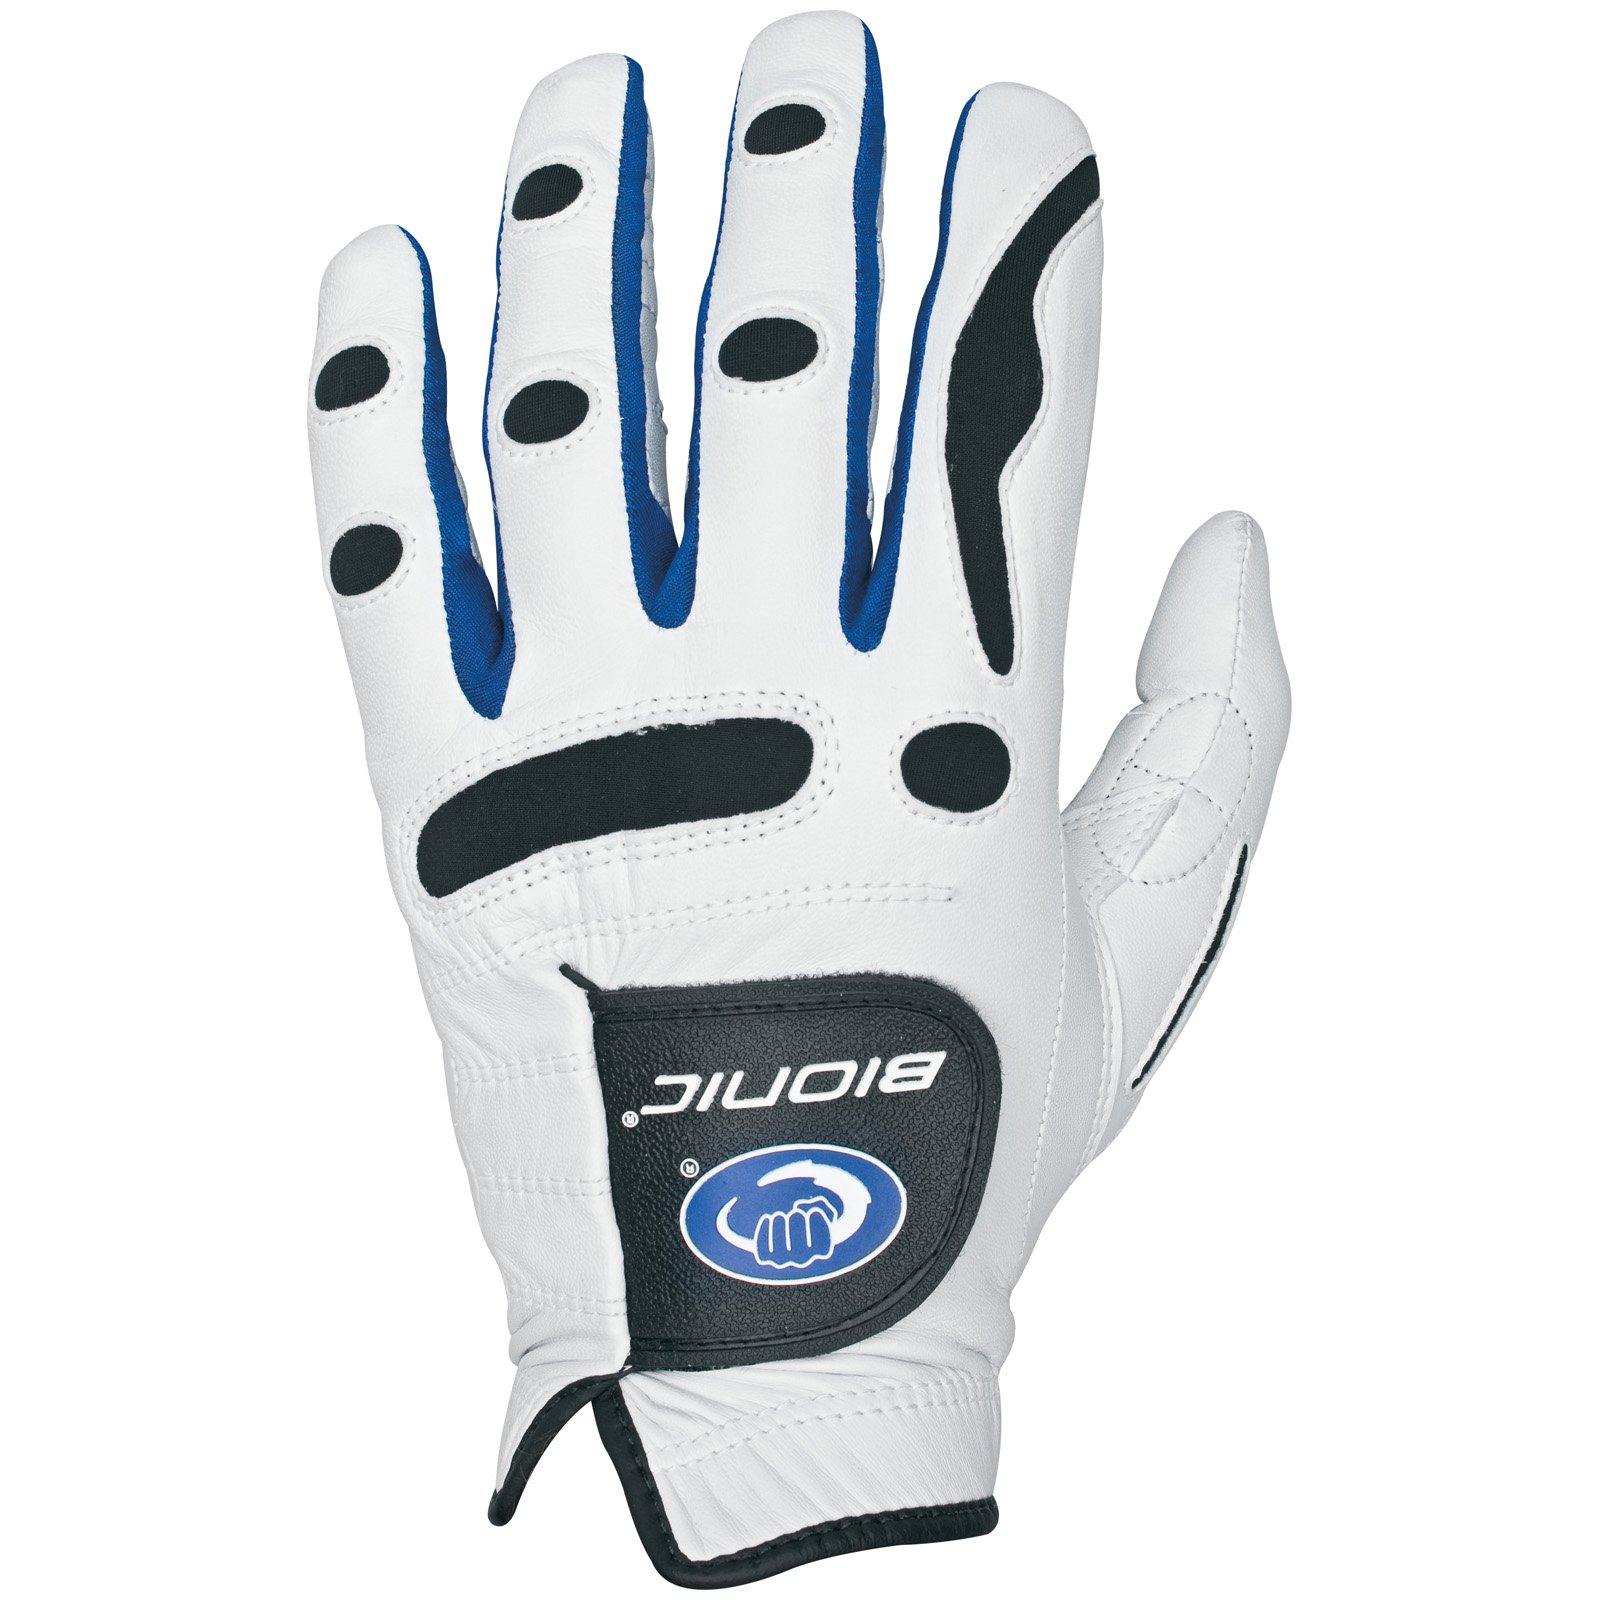 Bionic Men's Right Hand Performance Series Golf Glove